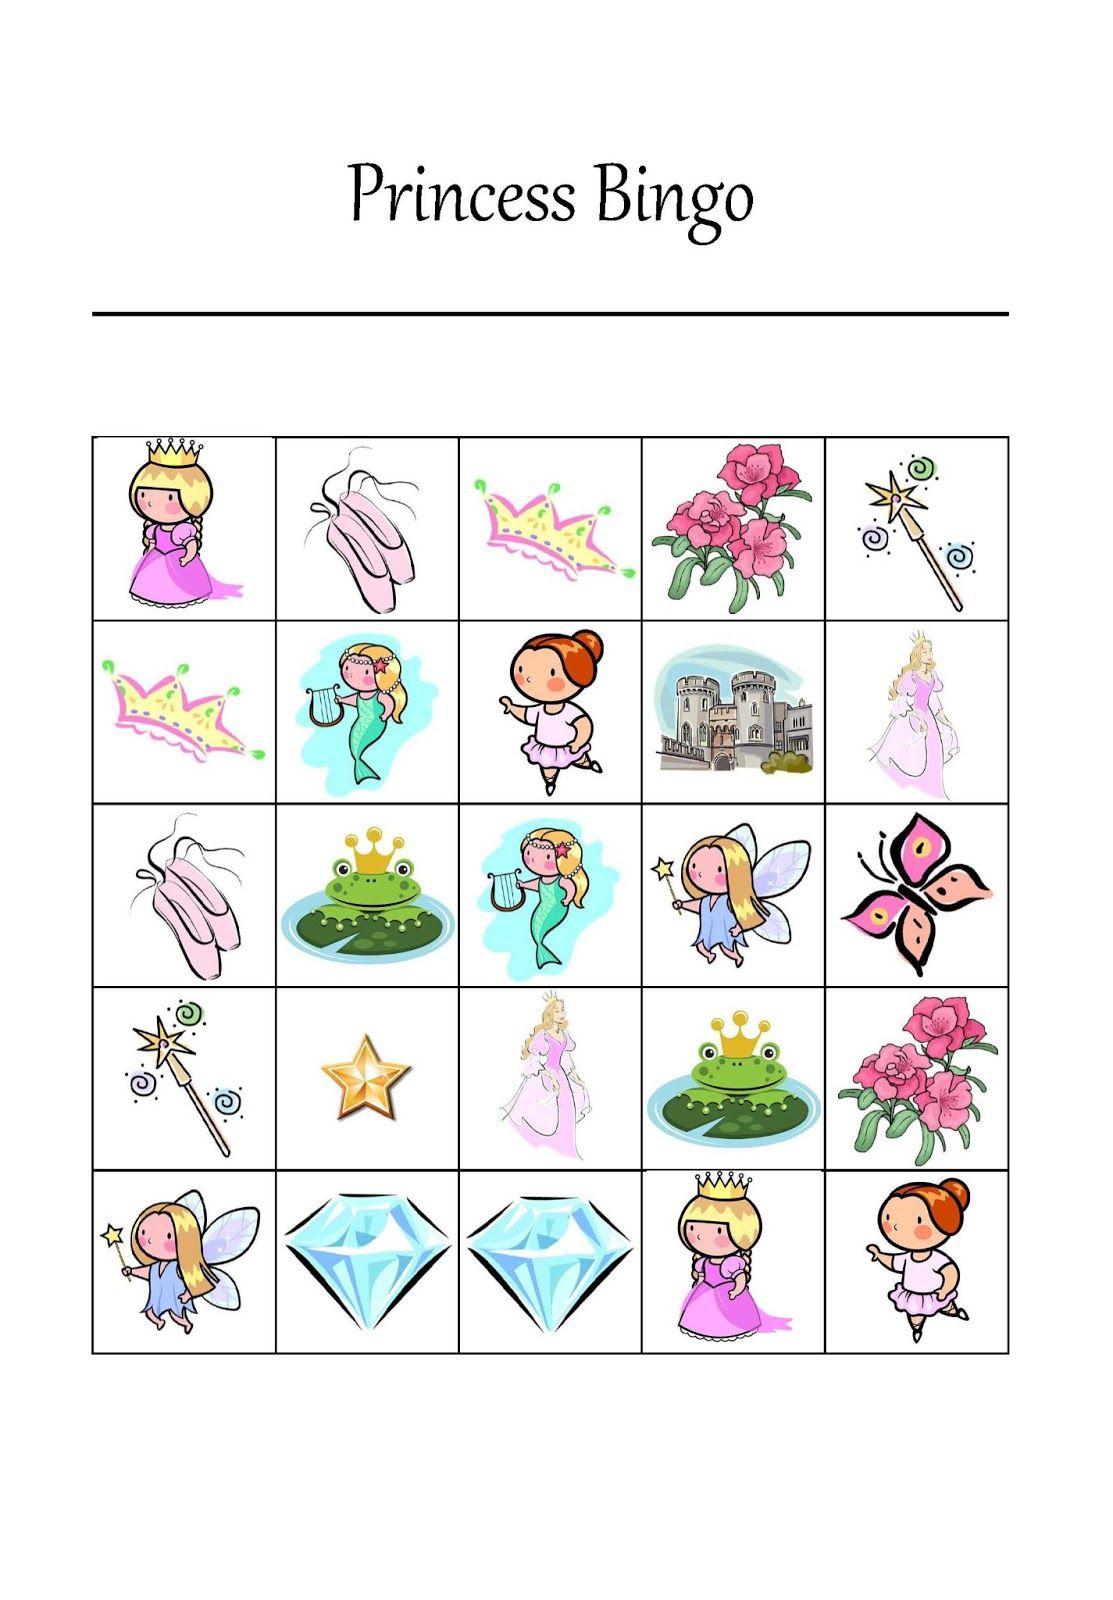 It's A Princess Thing: Free Printable Princess Bingo Game   Party - Free Printable Tea Party Games